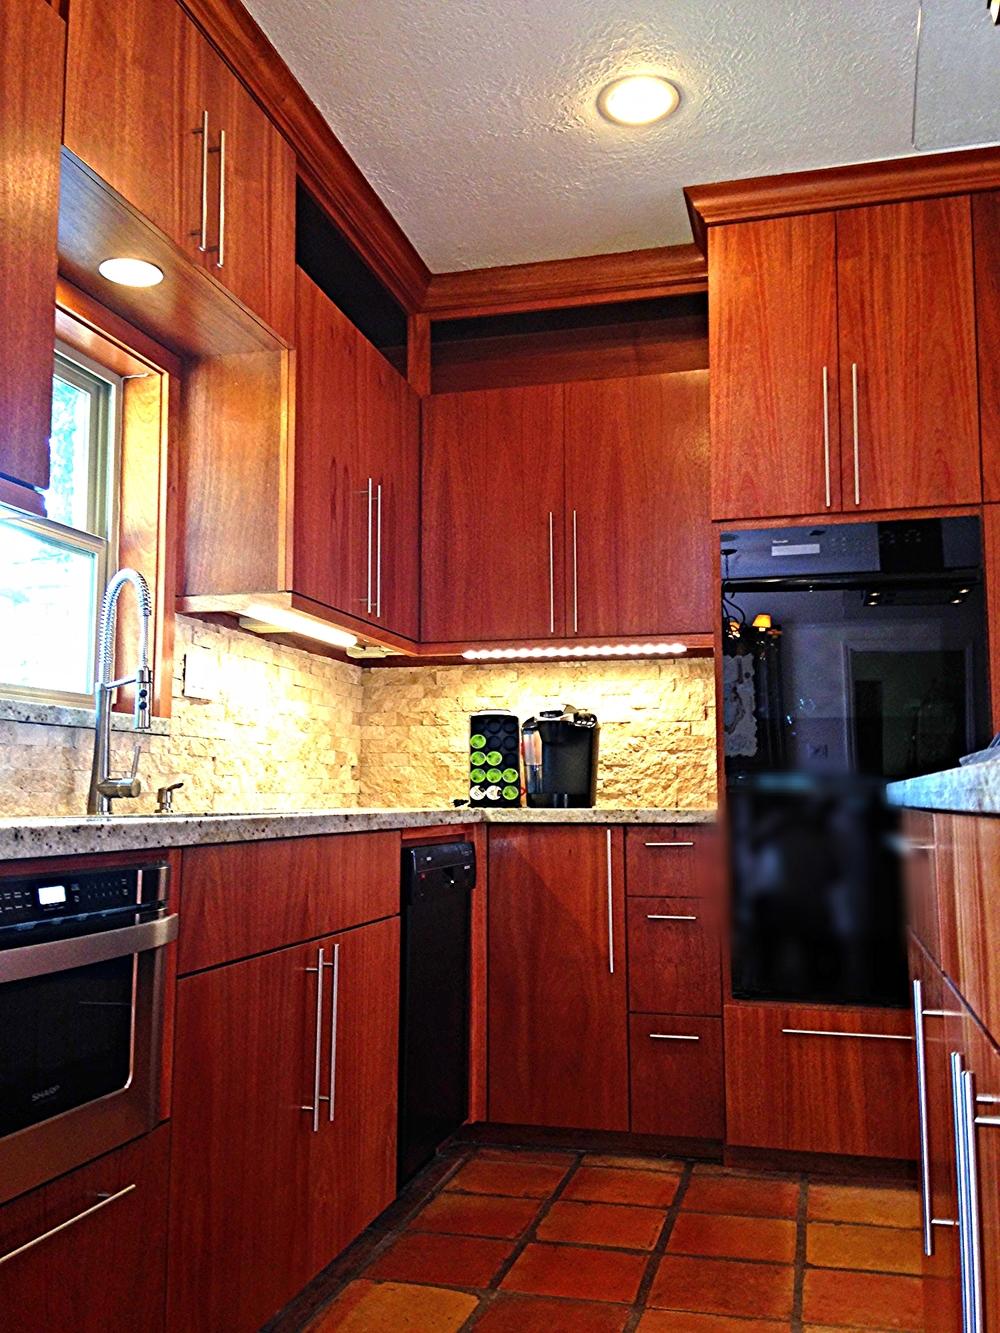 Bukolt kitchen remodel view six